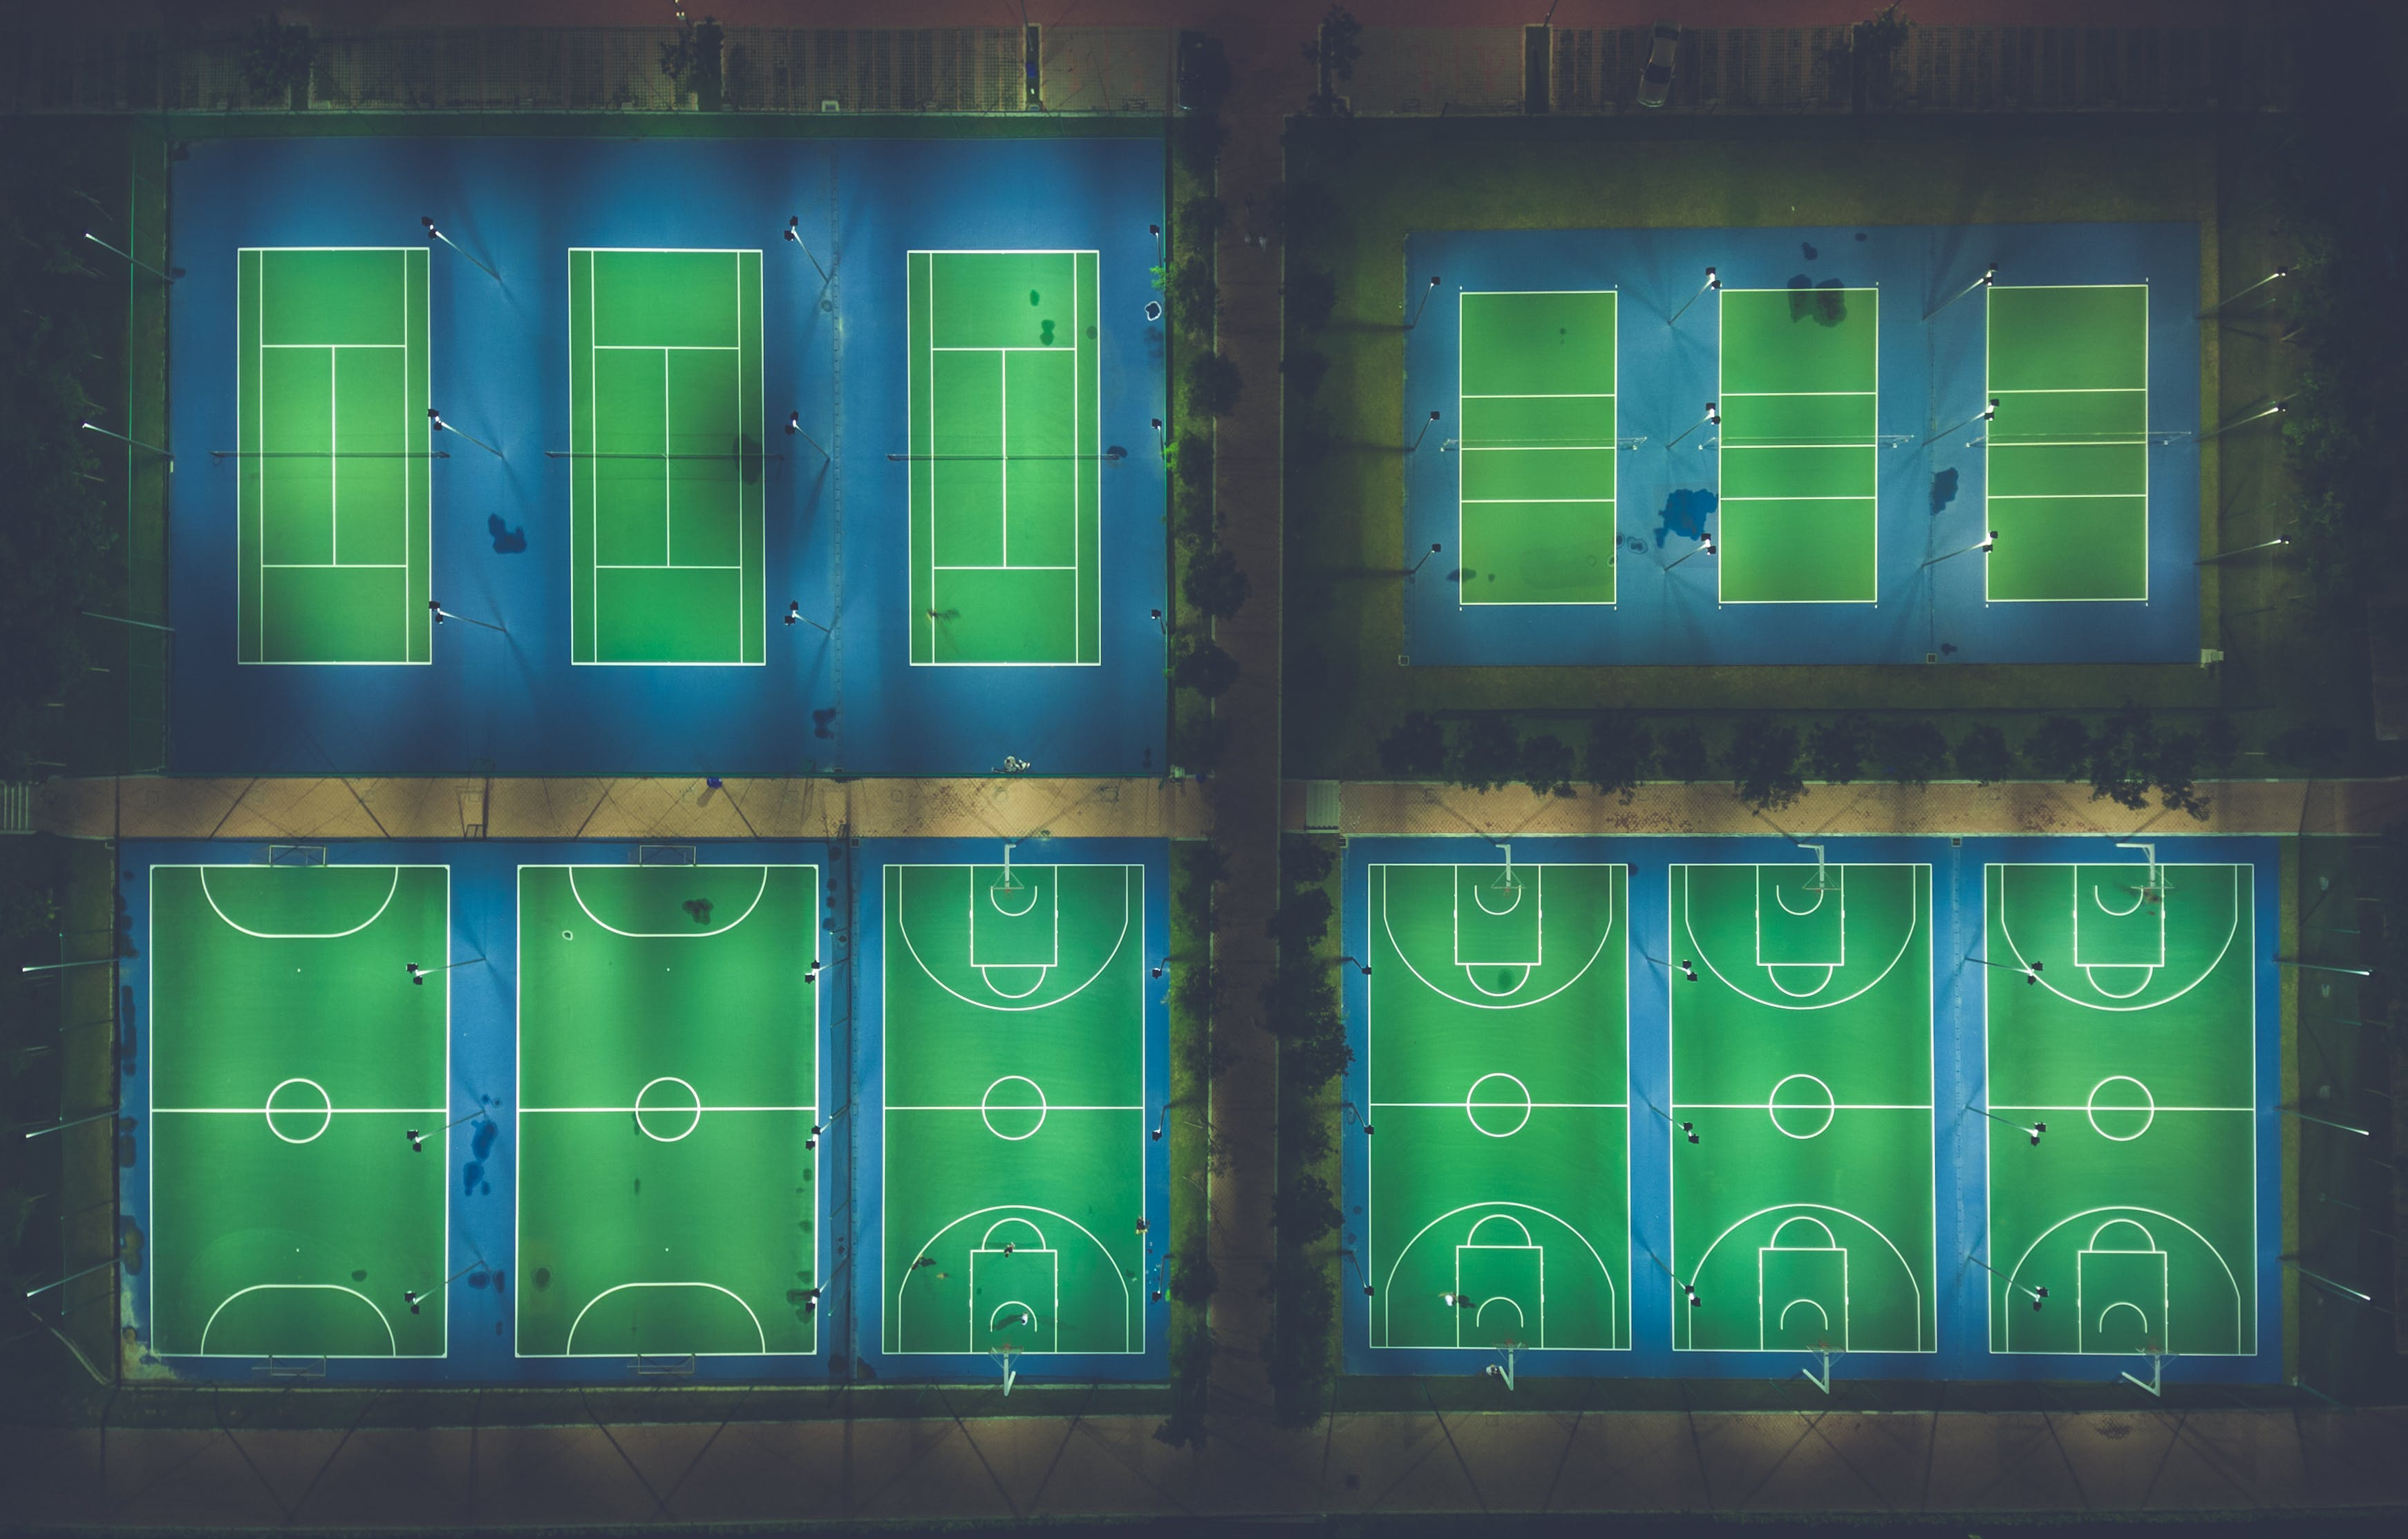 Sports Court Illustration